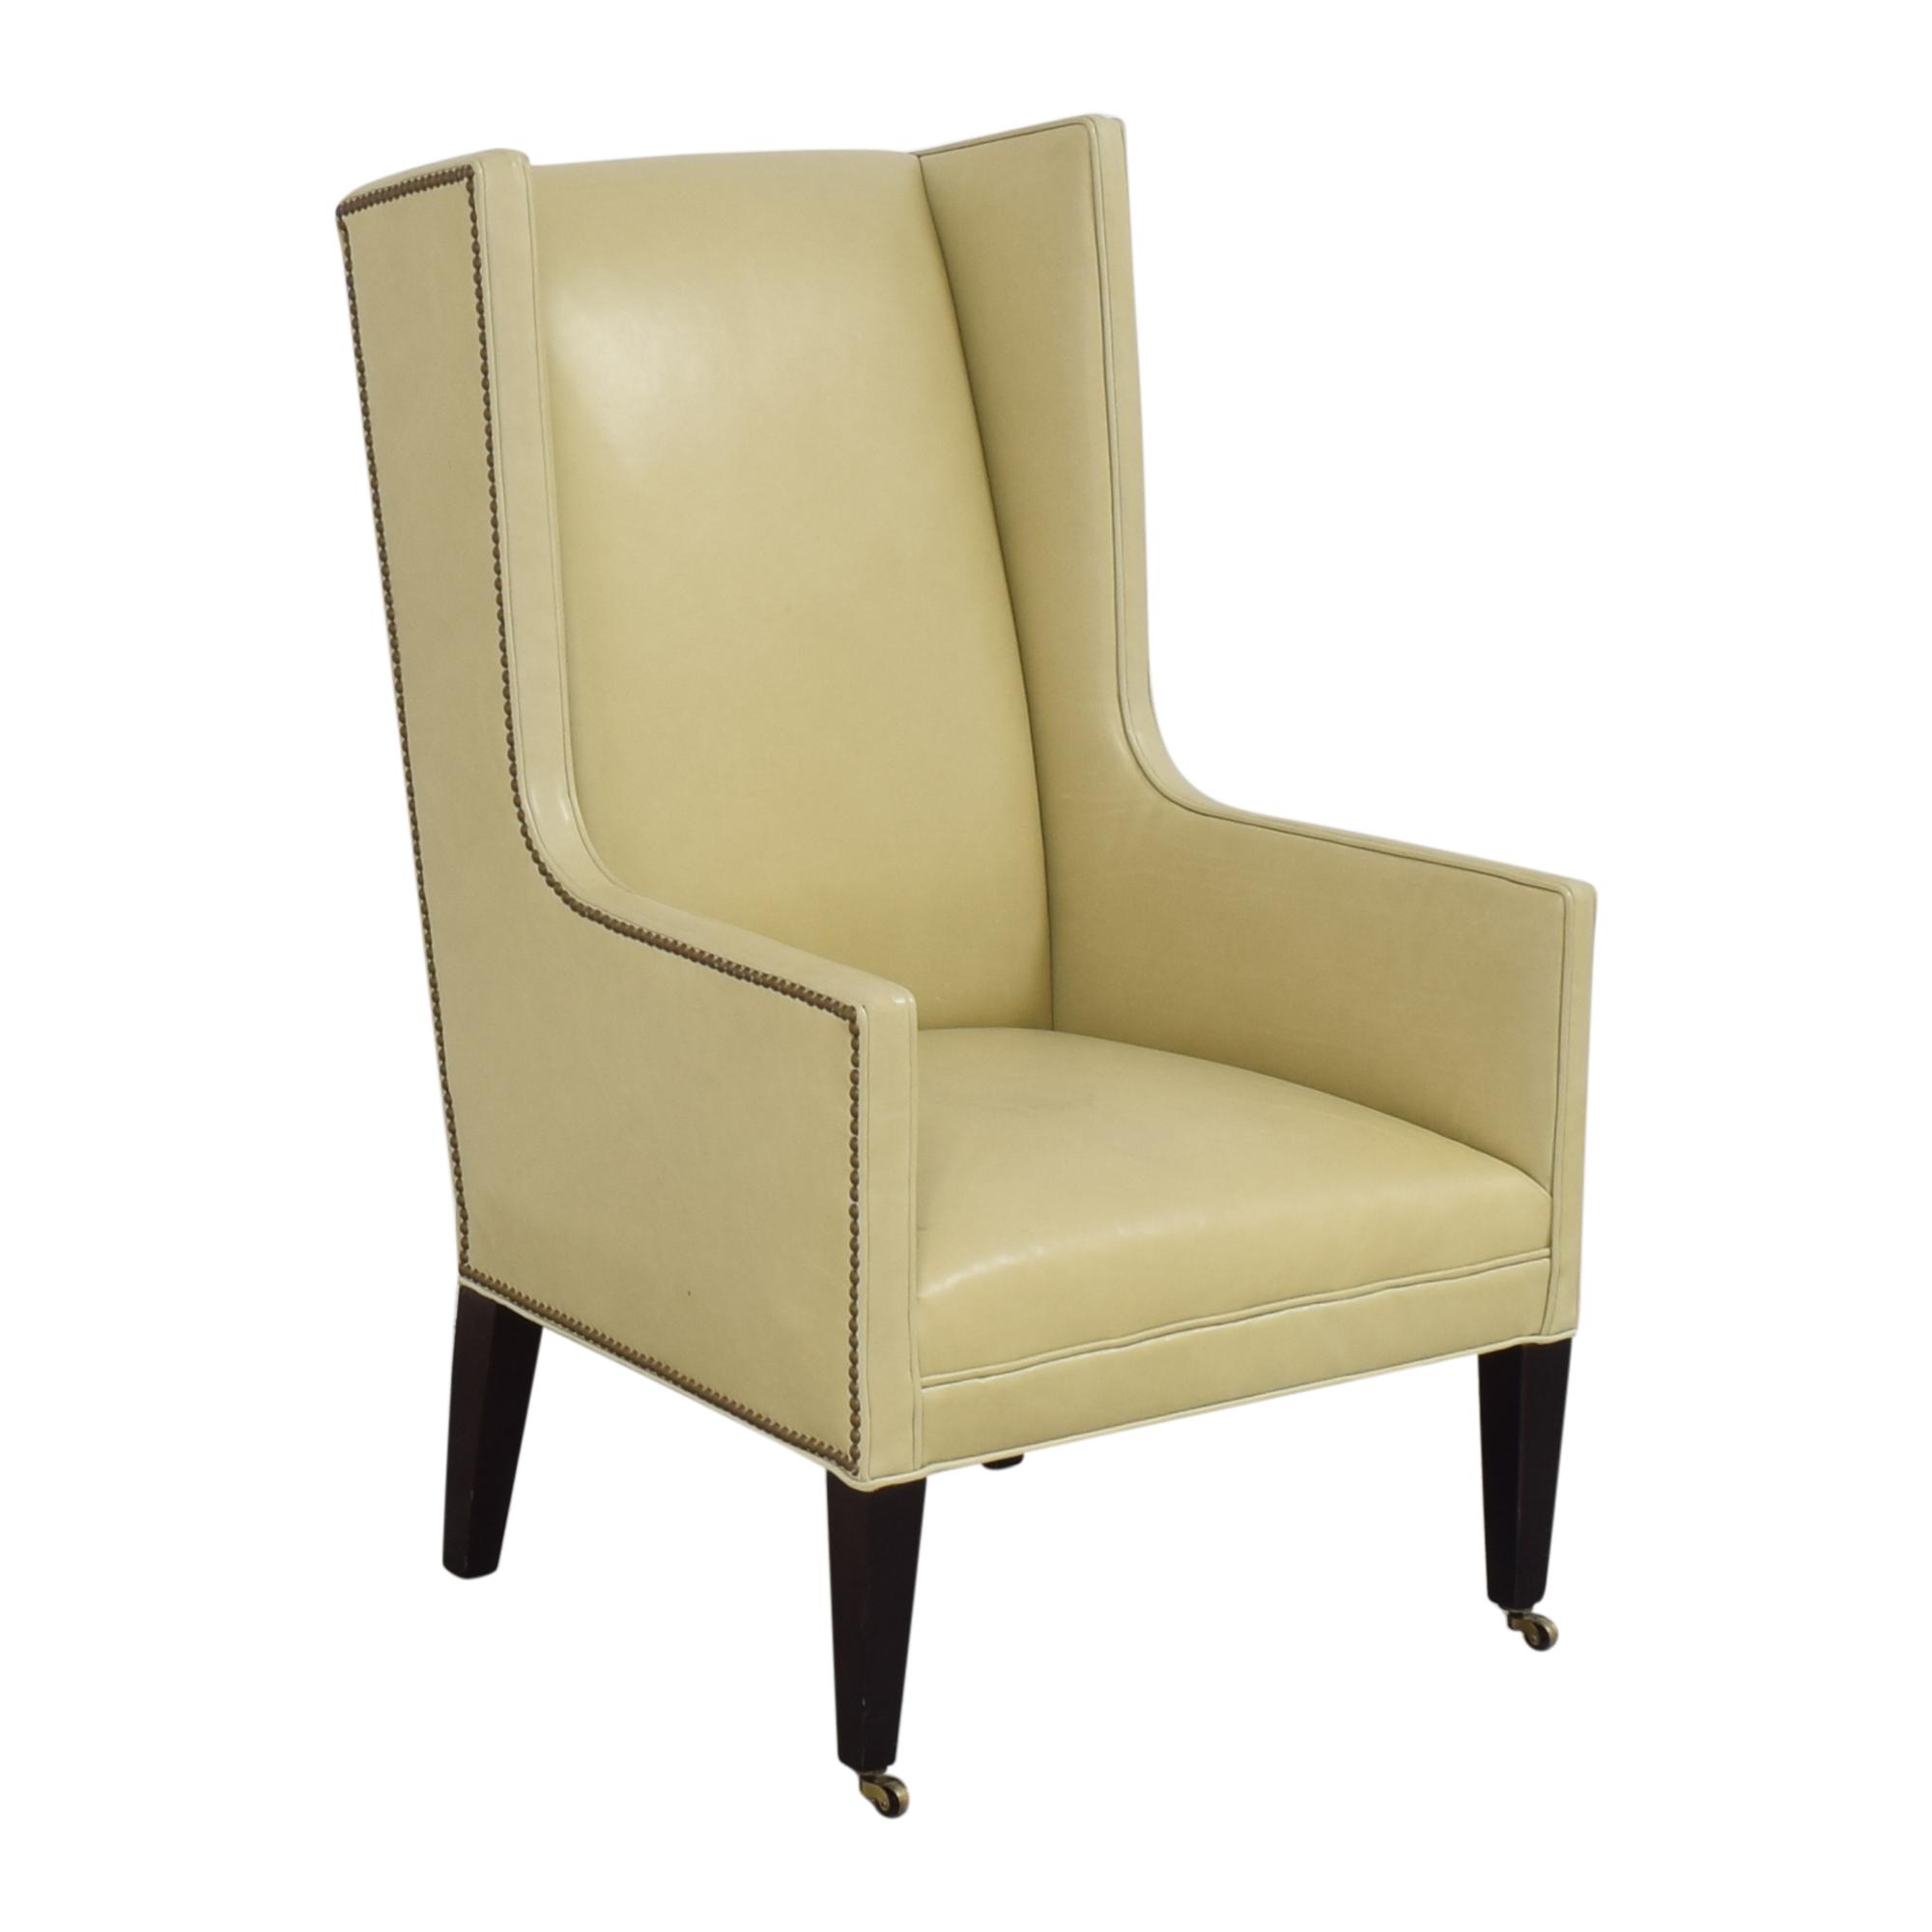 shop Crate & Barrel Wingback Chair Crate & Barrel Chairs